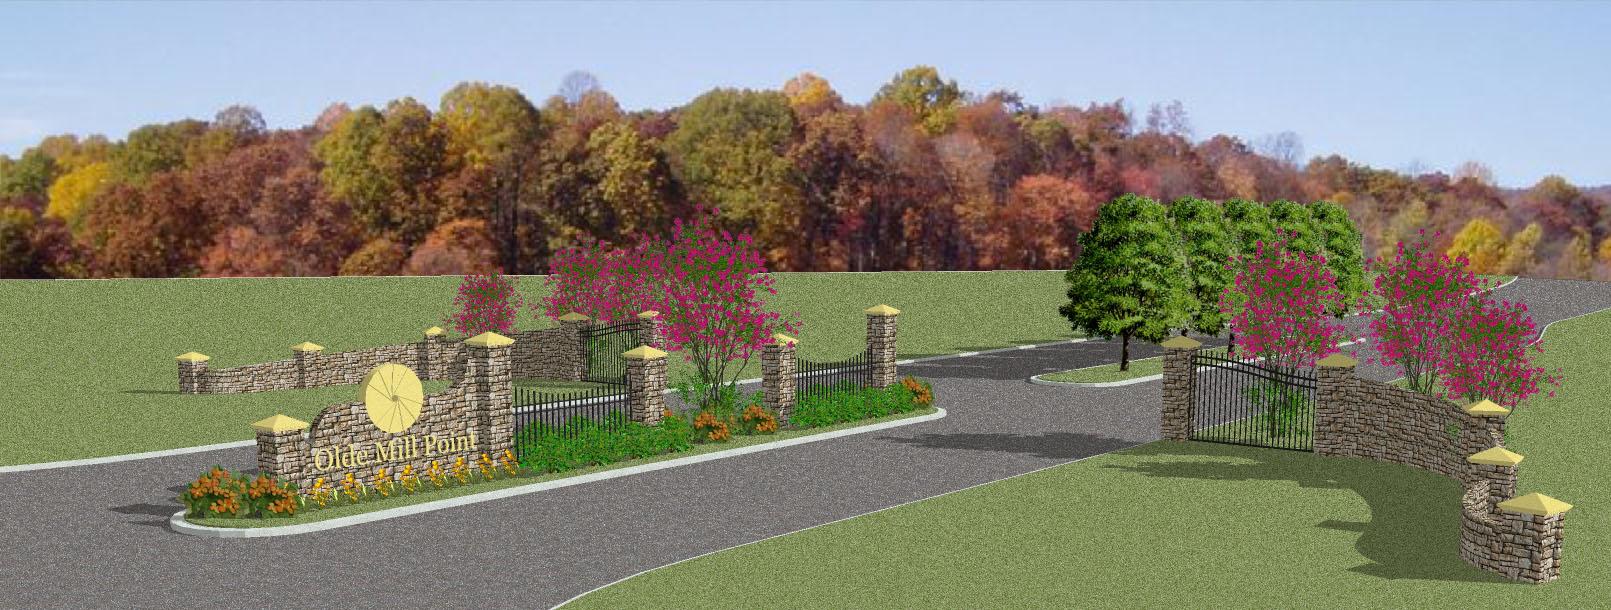 Subdivisions Las Llc Delaware Landscape Architecture Serving Delaware Maryland